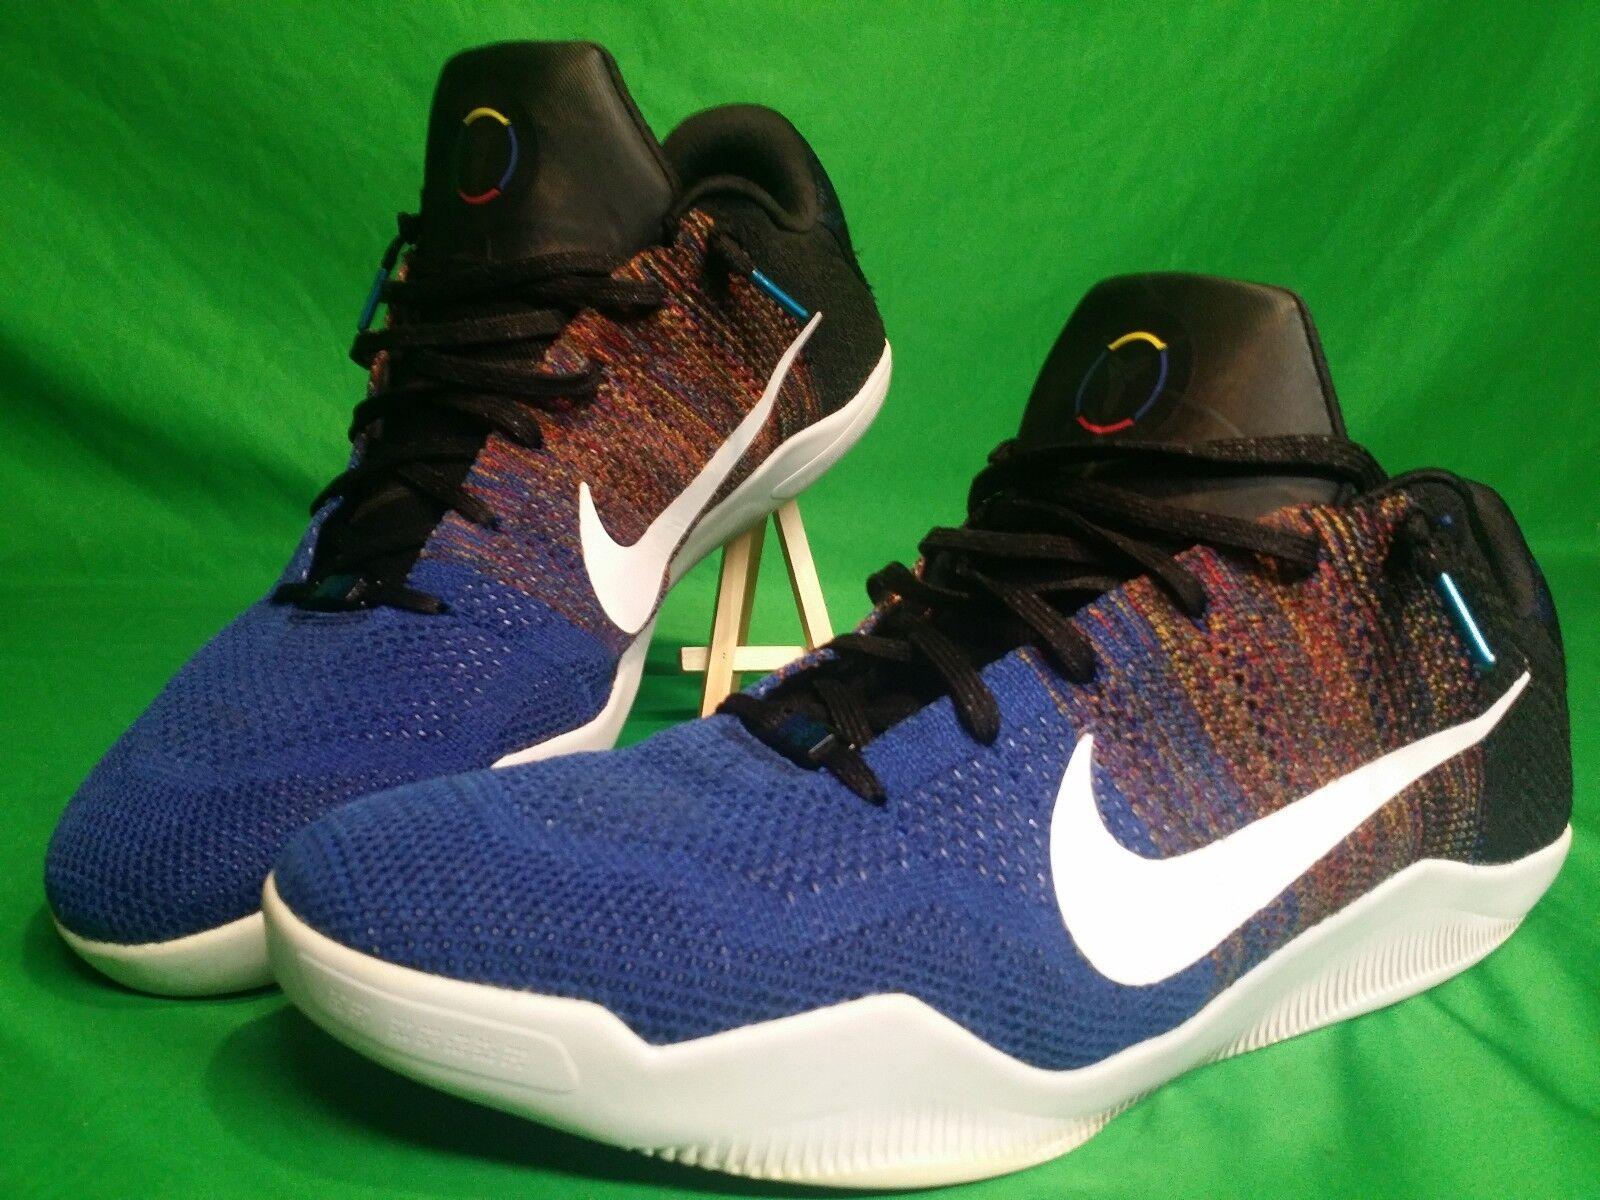 Nike Kobe XI Elite Low Black History Month 822522-914 Size 18 Basketball shoes